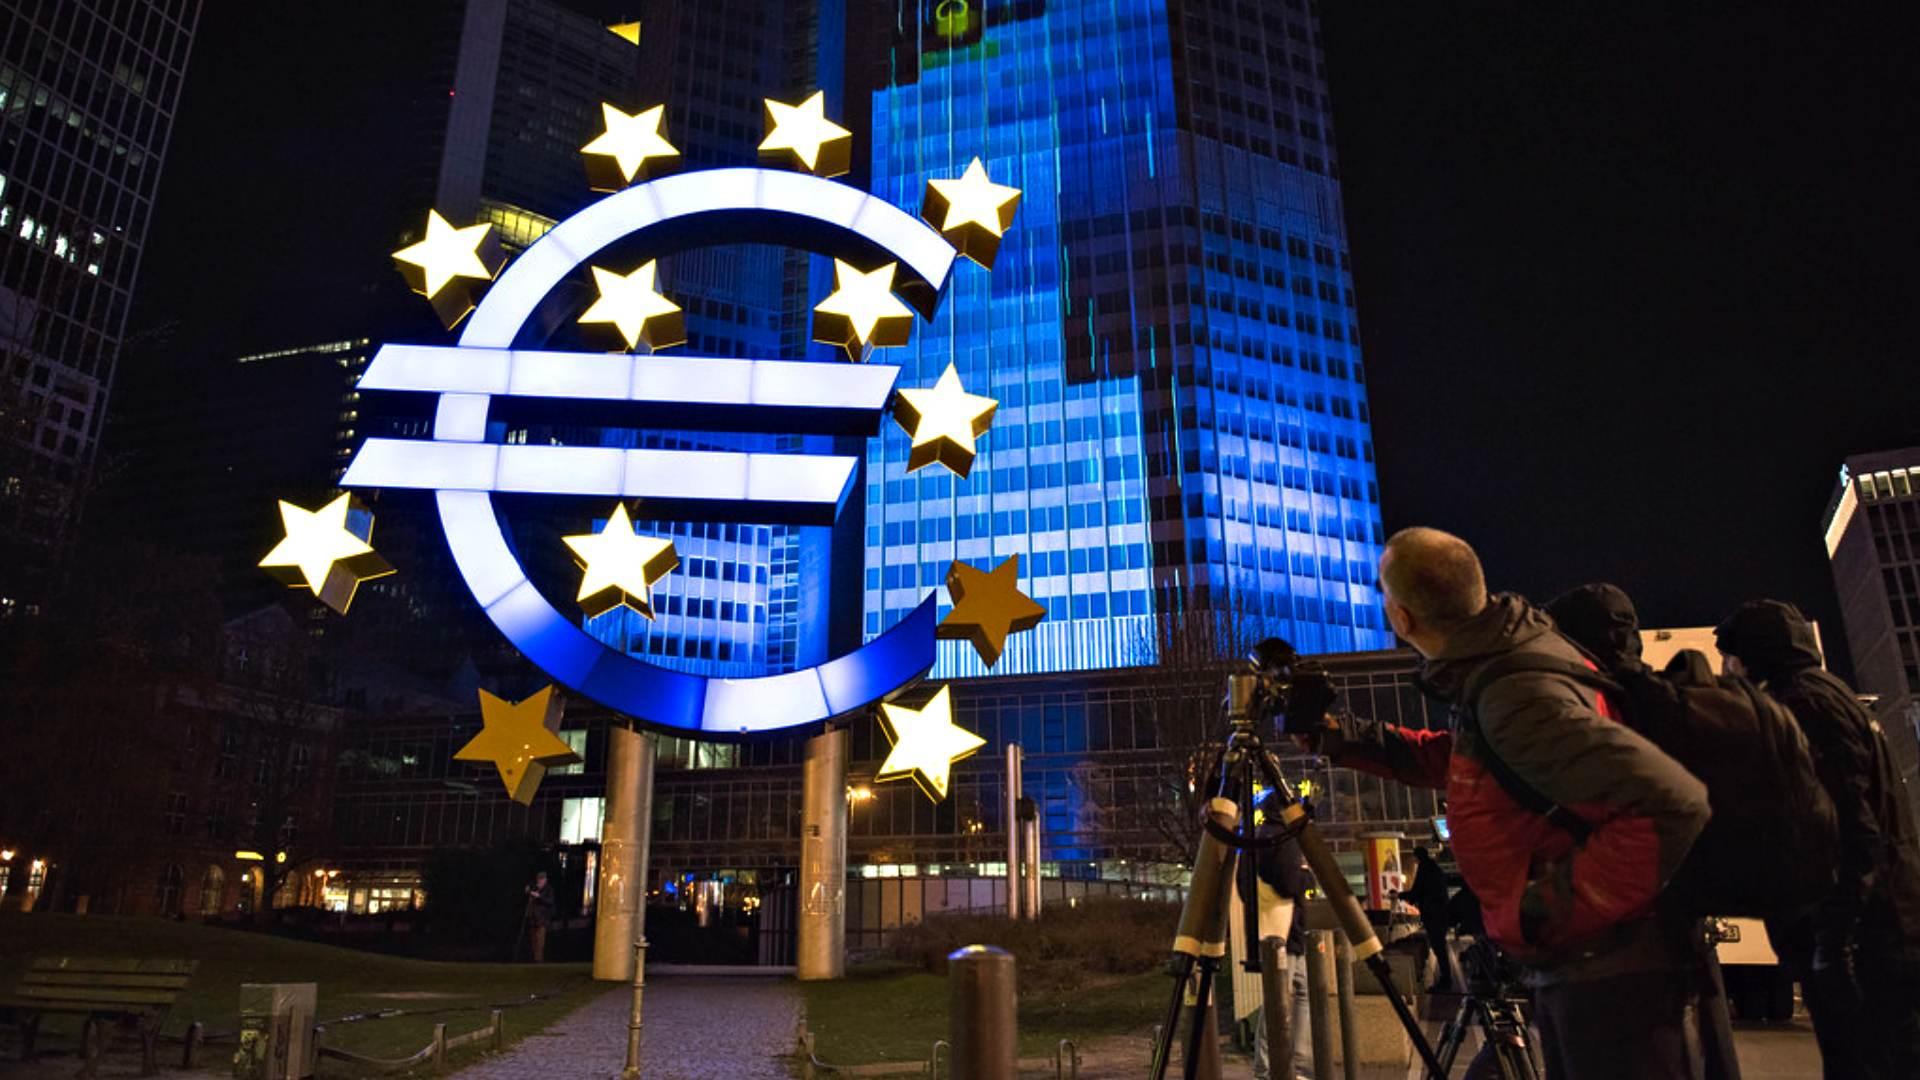 europai kozponti bank digitalis euro